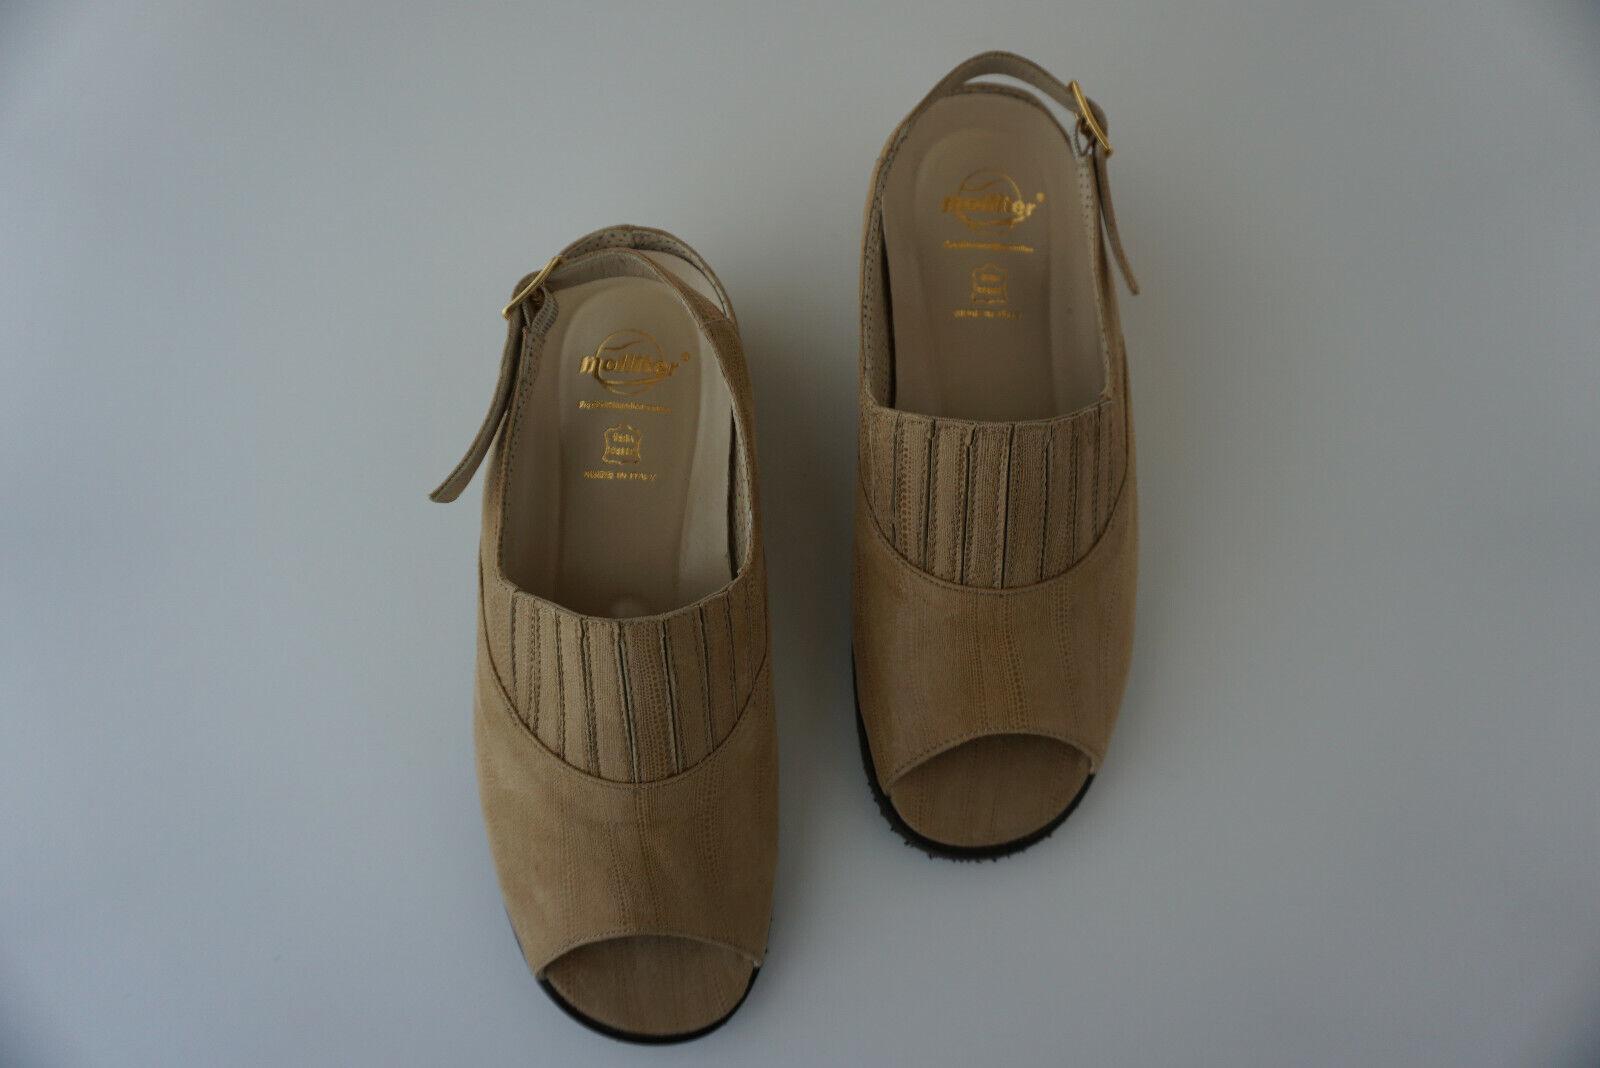 Orthopädisch molliter femmes Sandale D'été chaussures Velcro Taille 38 caramel en cuir NEUF